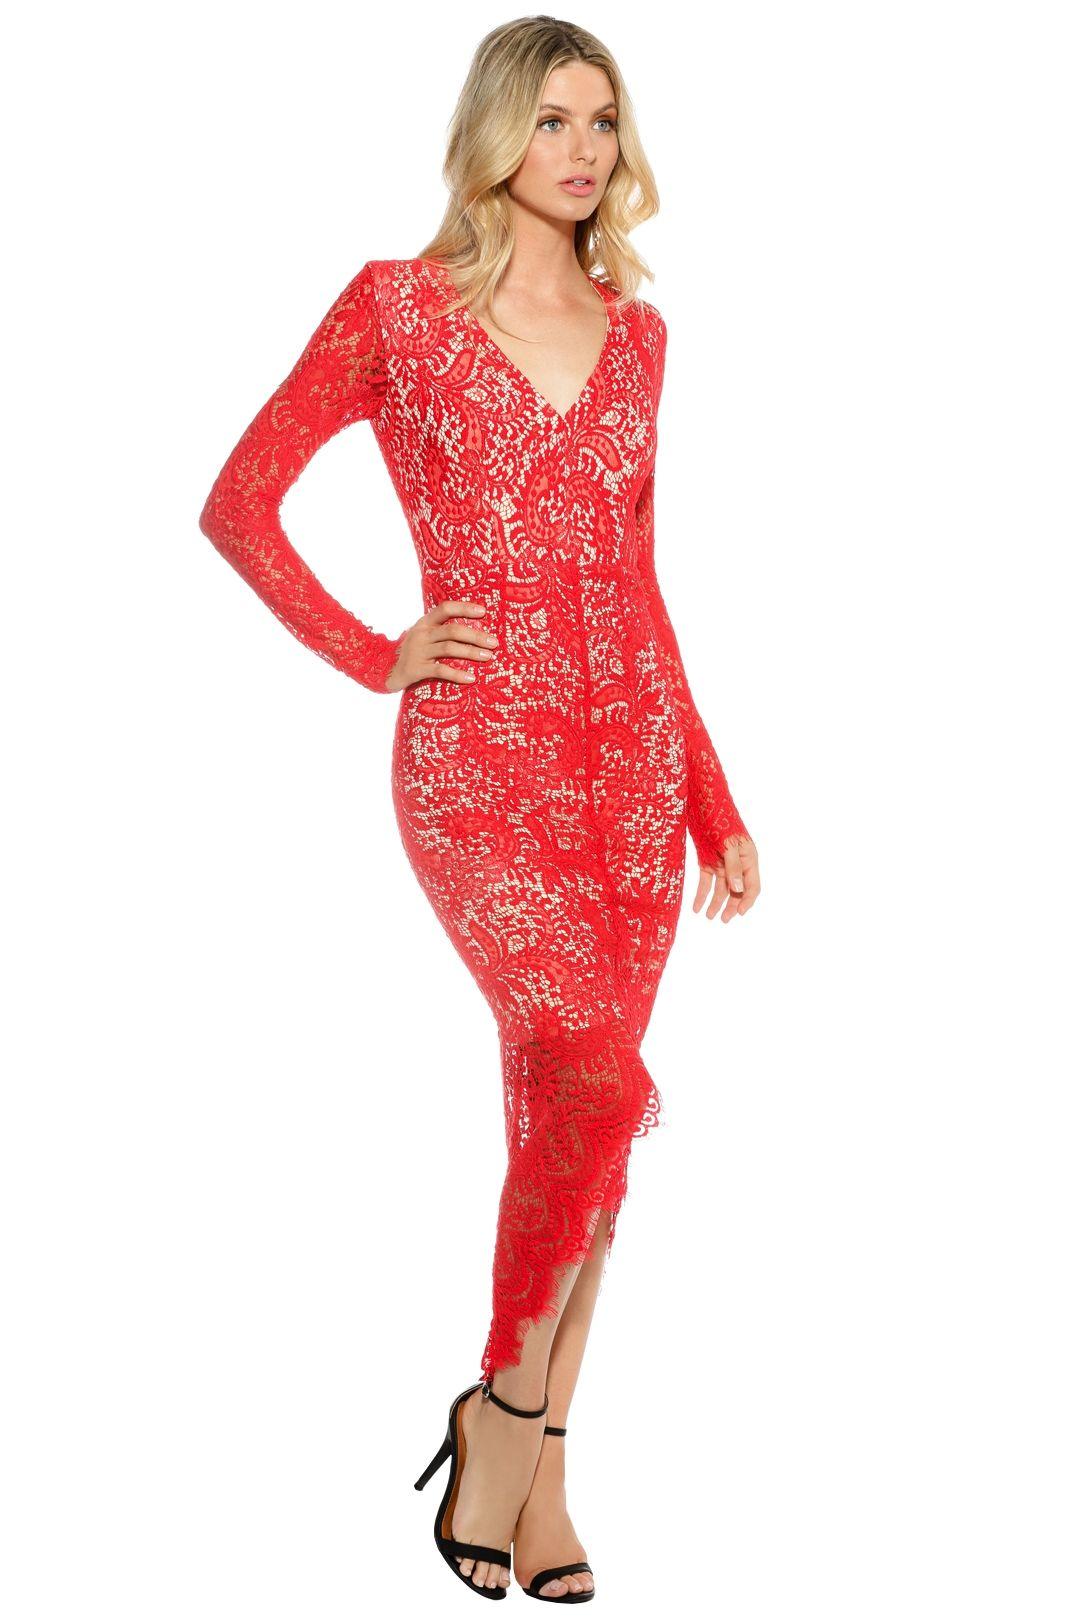 Elle Zeitoune - Cameron Dress - Red - side